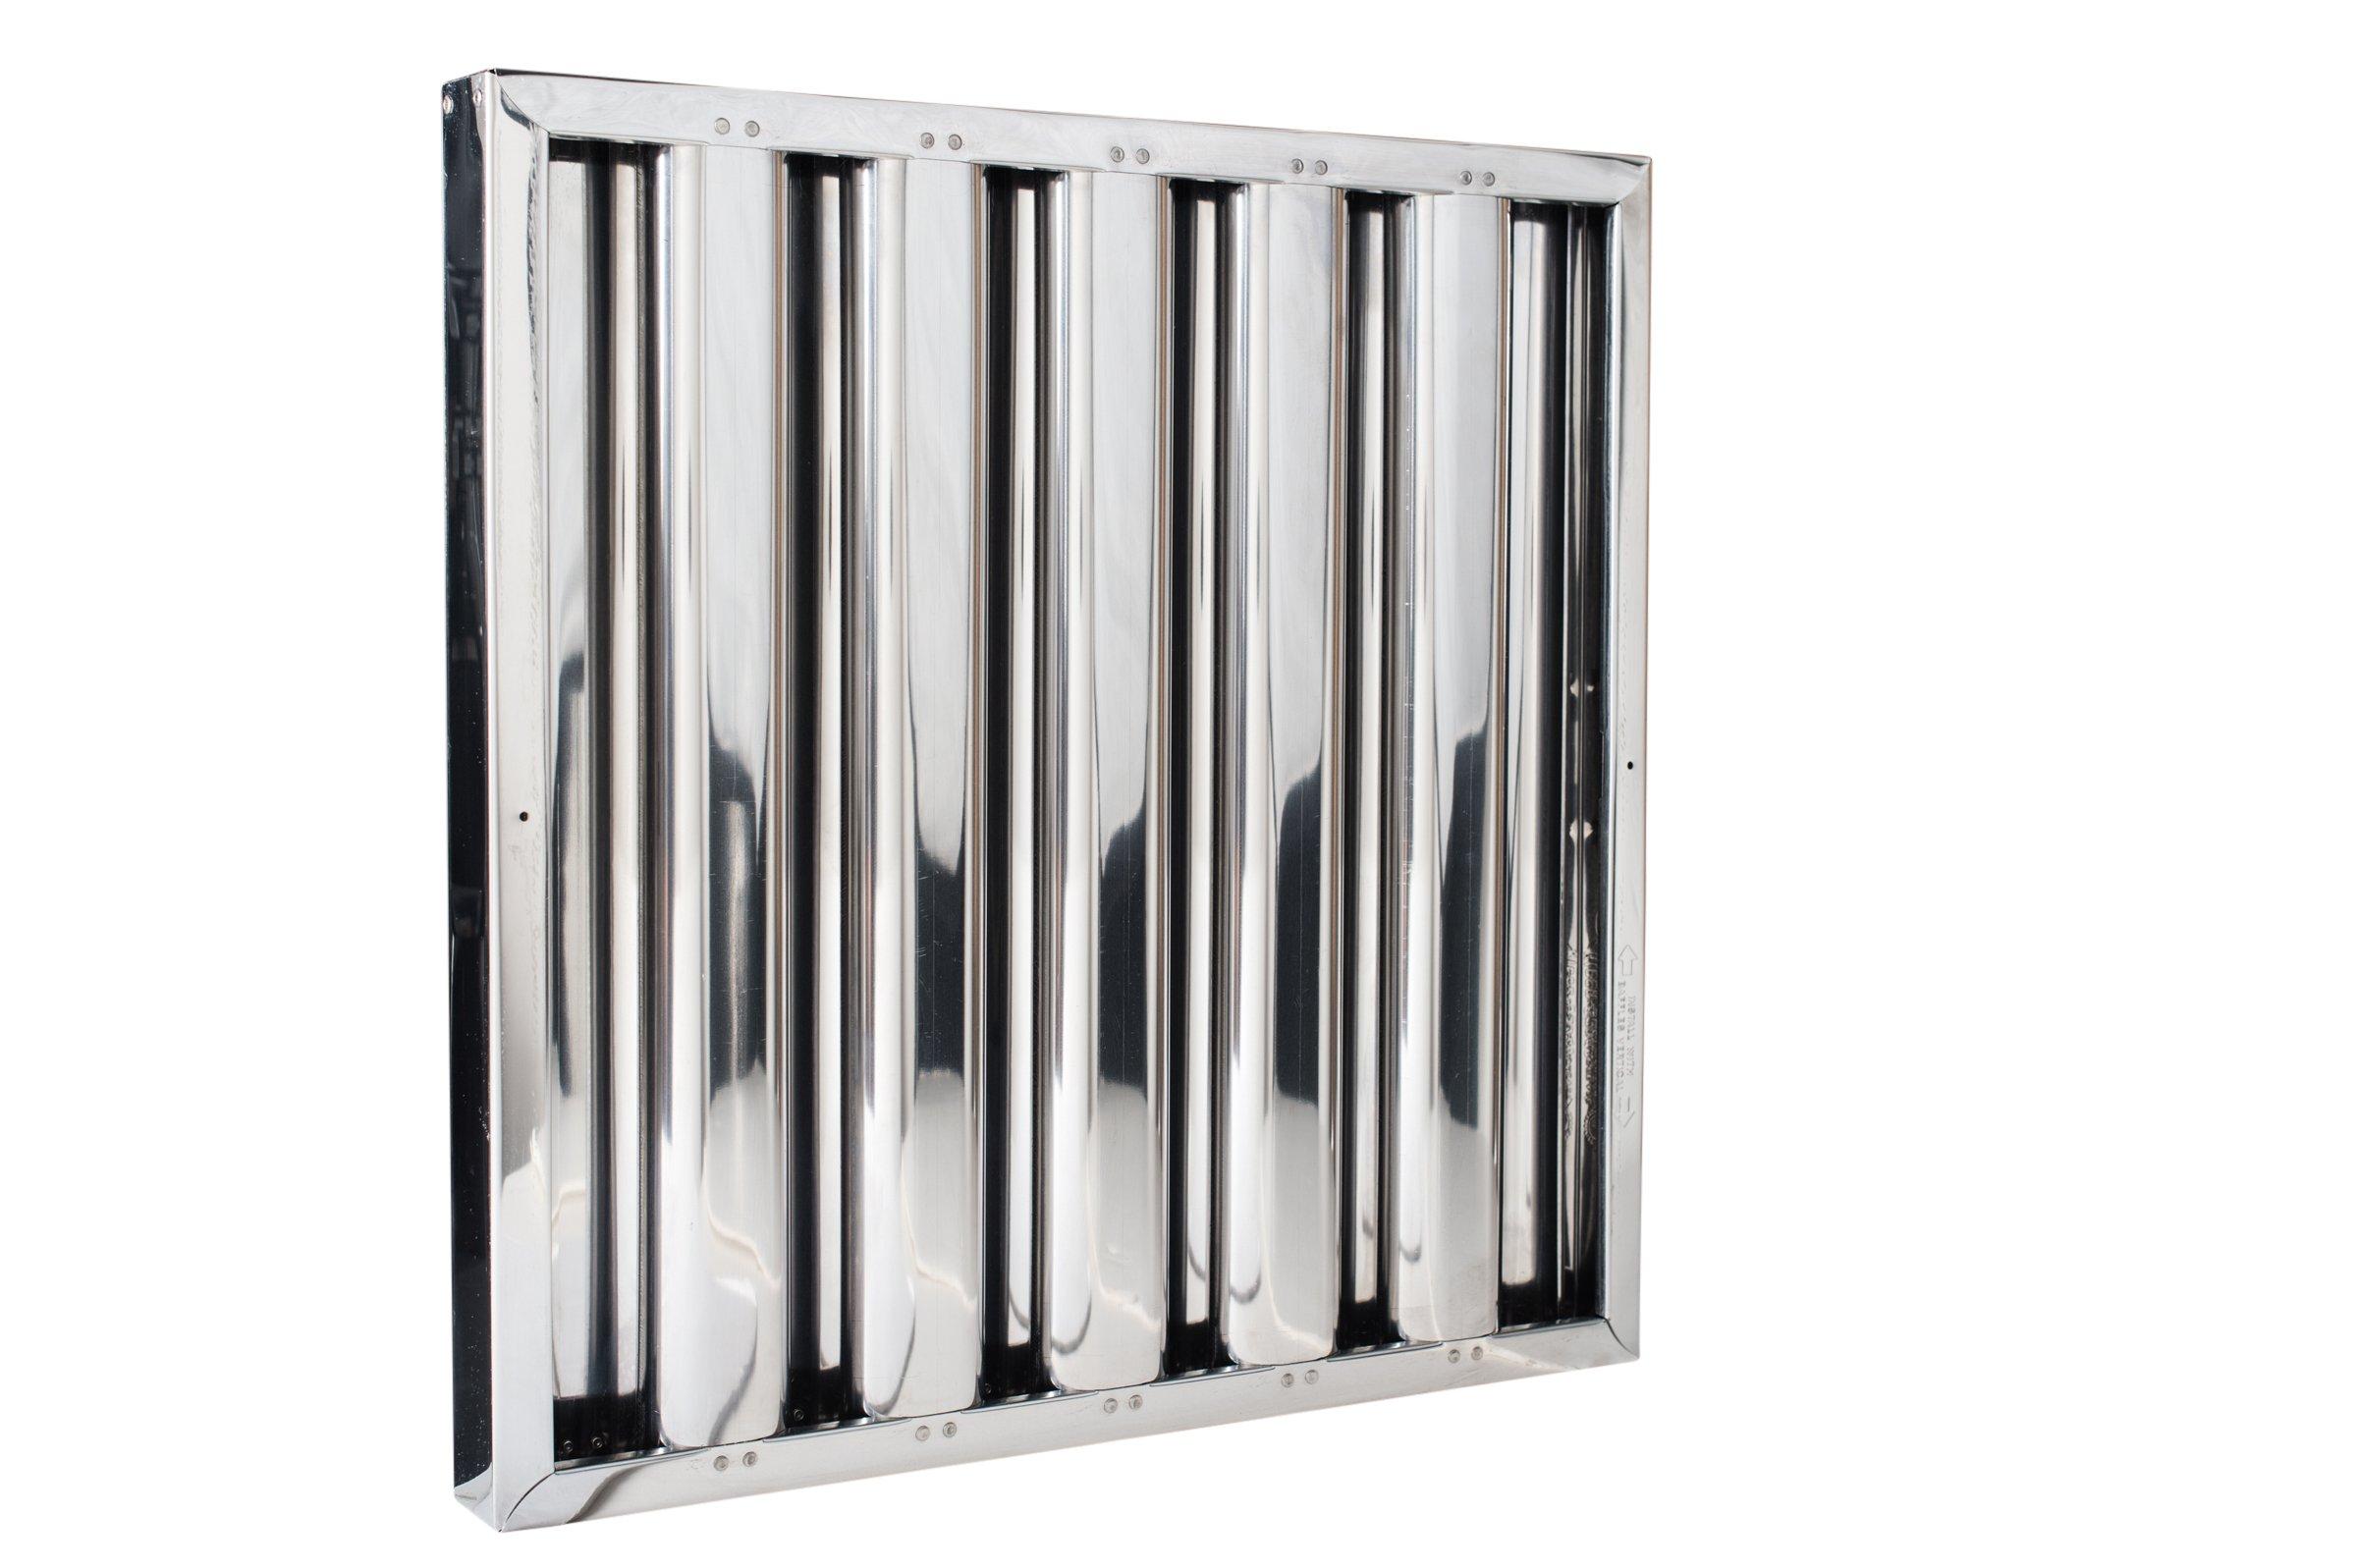 Stainless Steel Kleen Gard